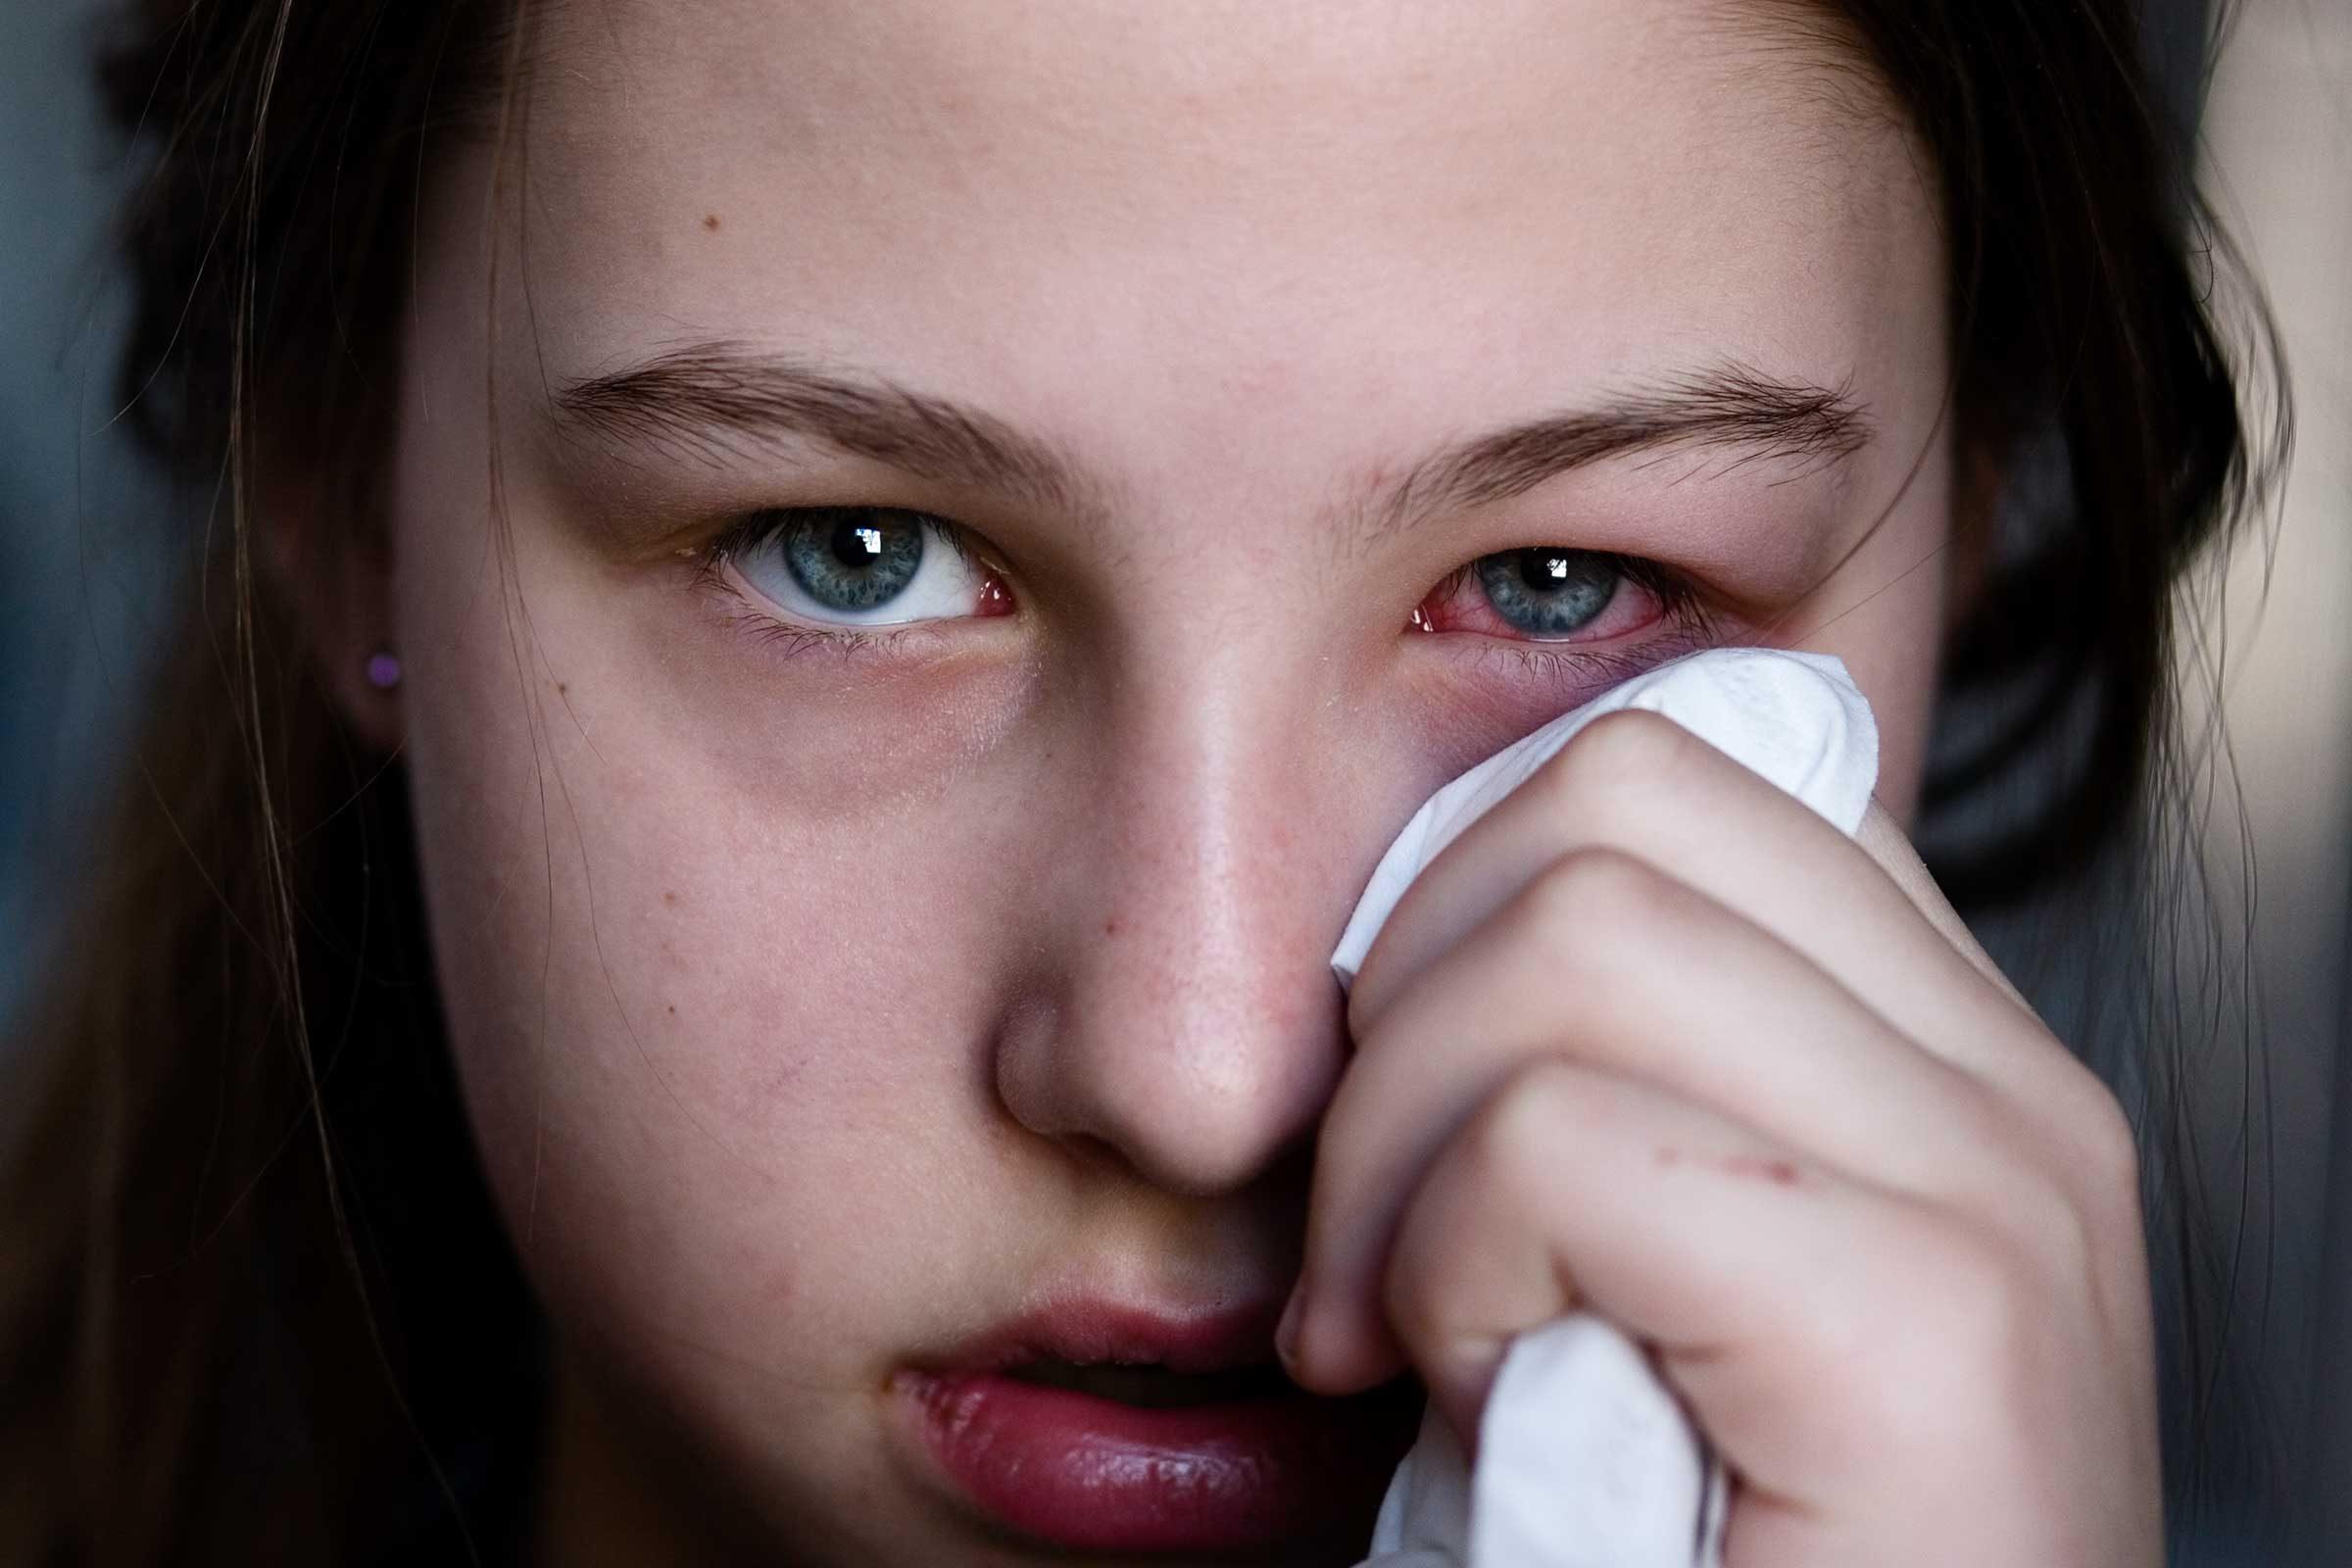 Pink Eye Symptoms You Shouldn't Ignore | Reader's Digest